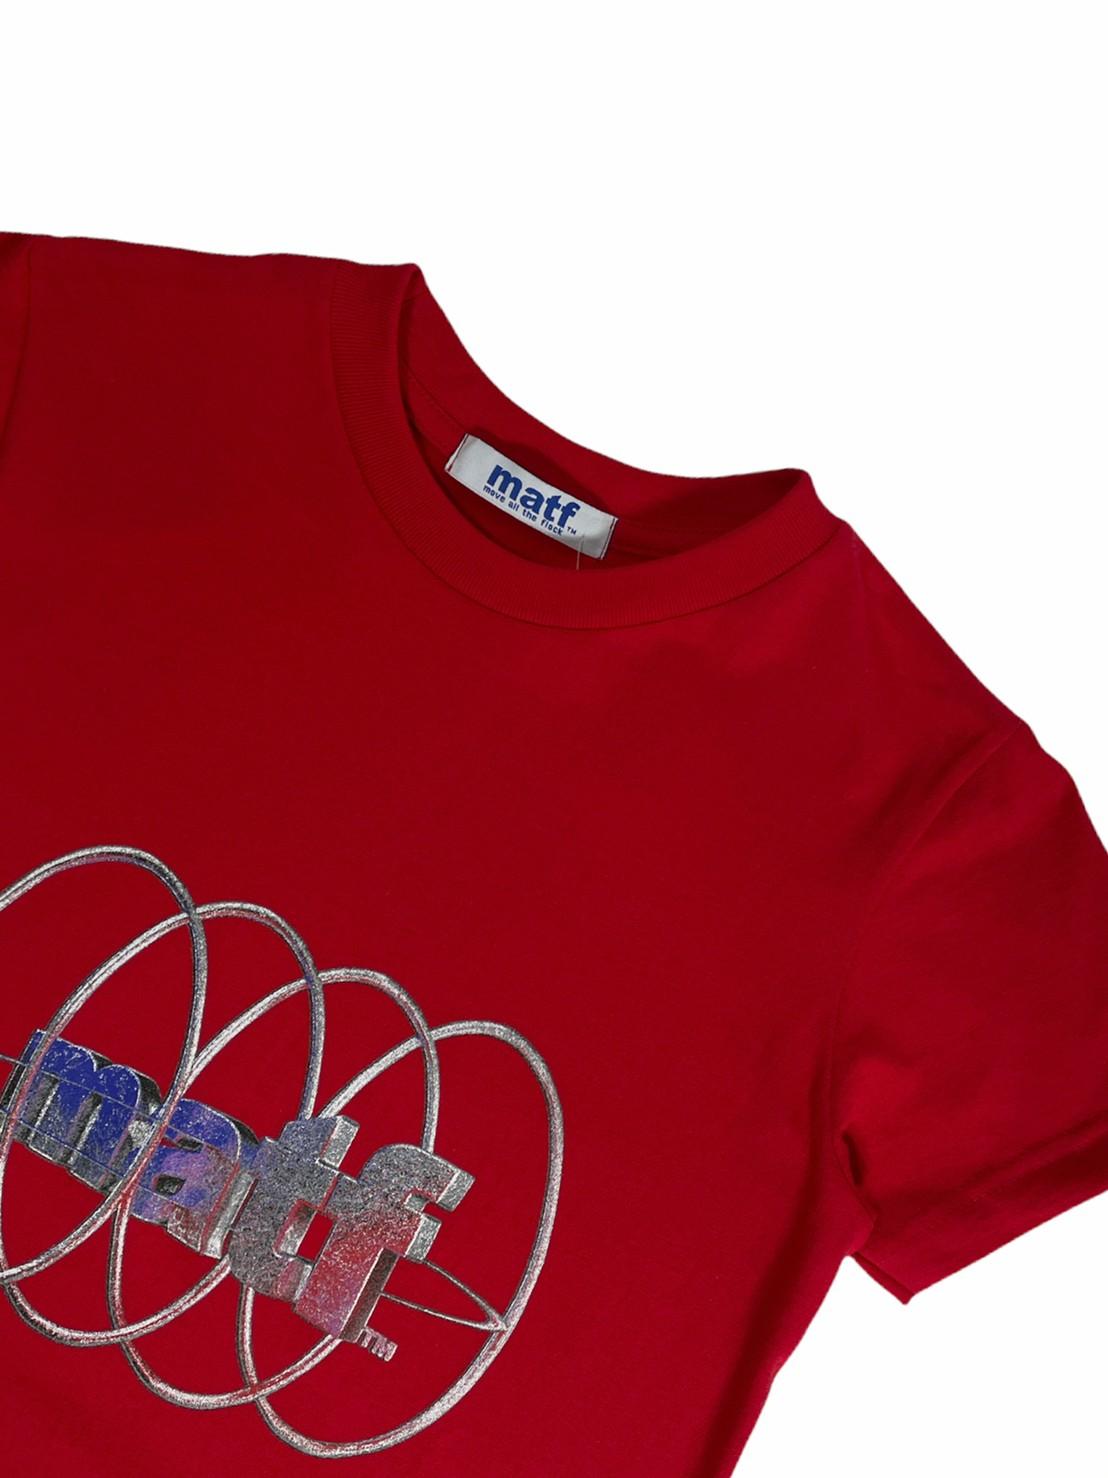 Matf trademark *spin rose* baby t-shirt